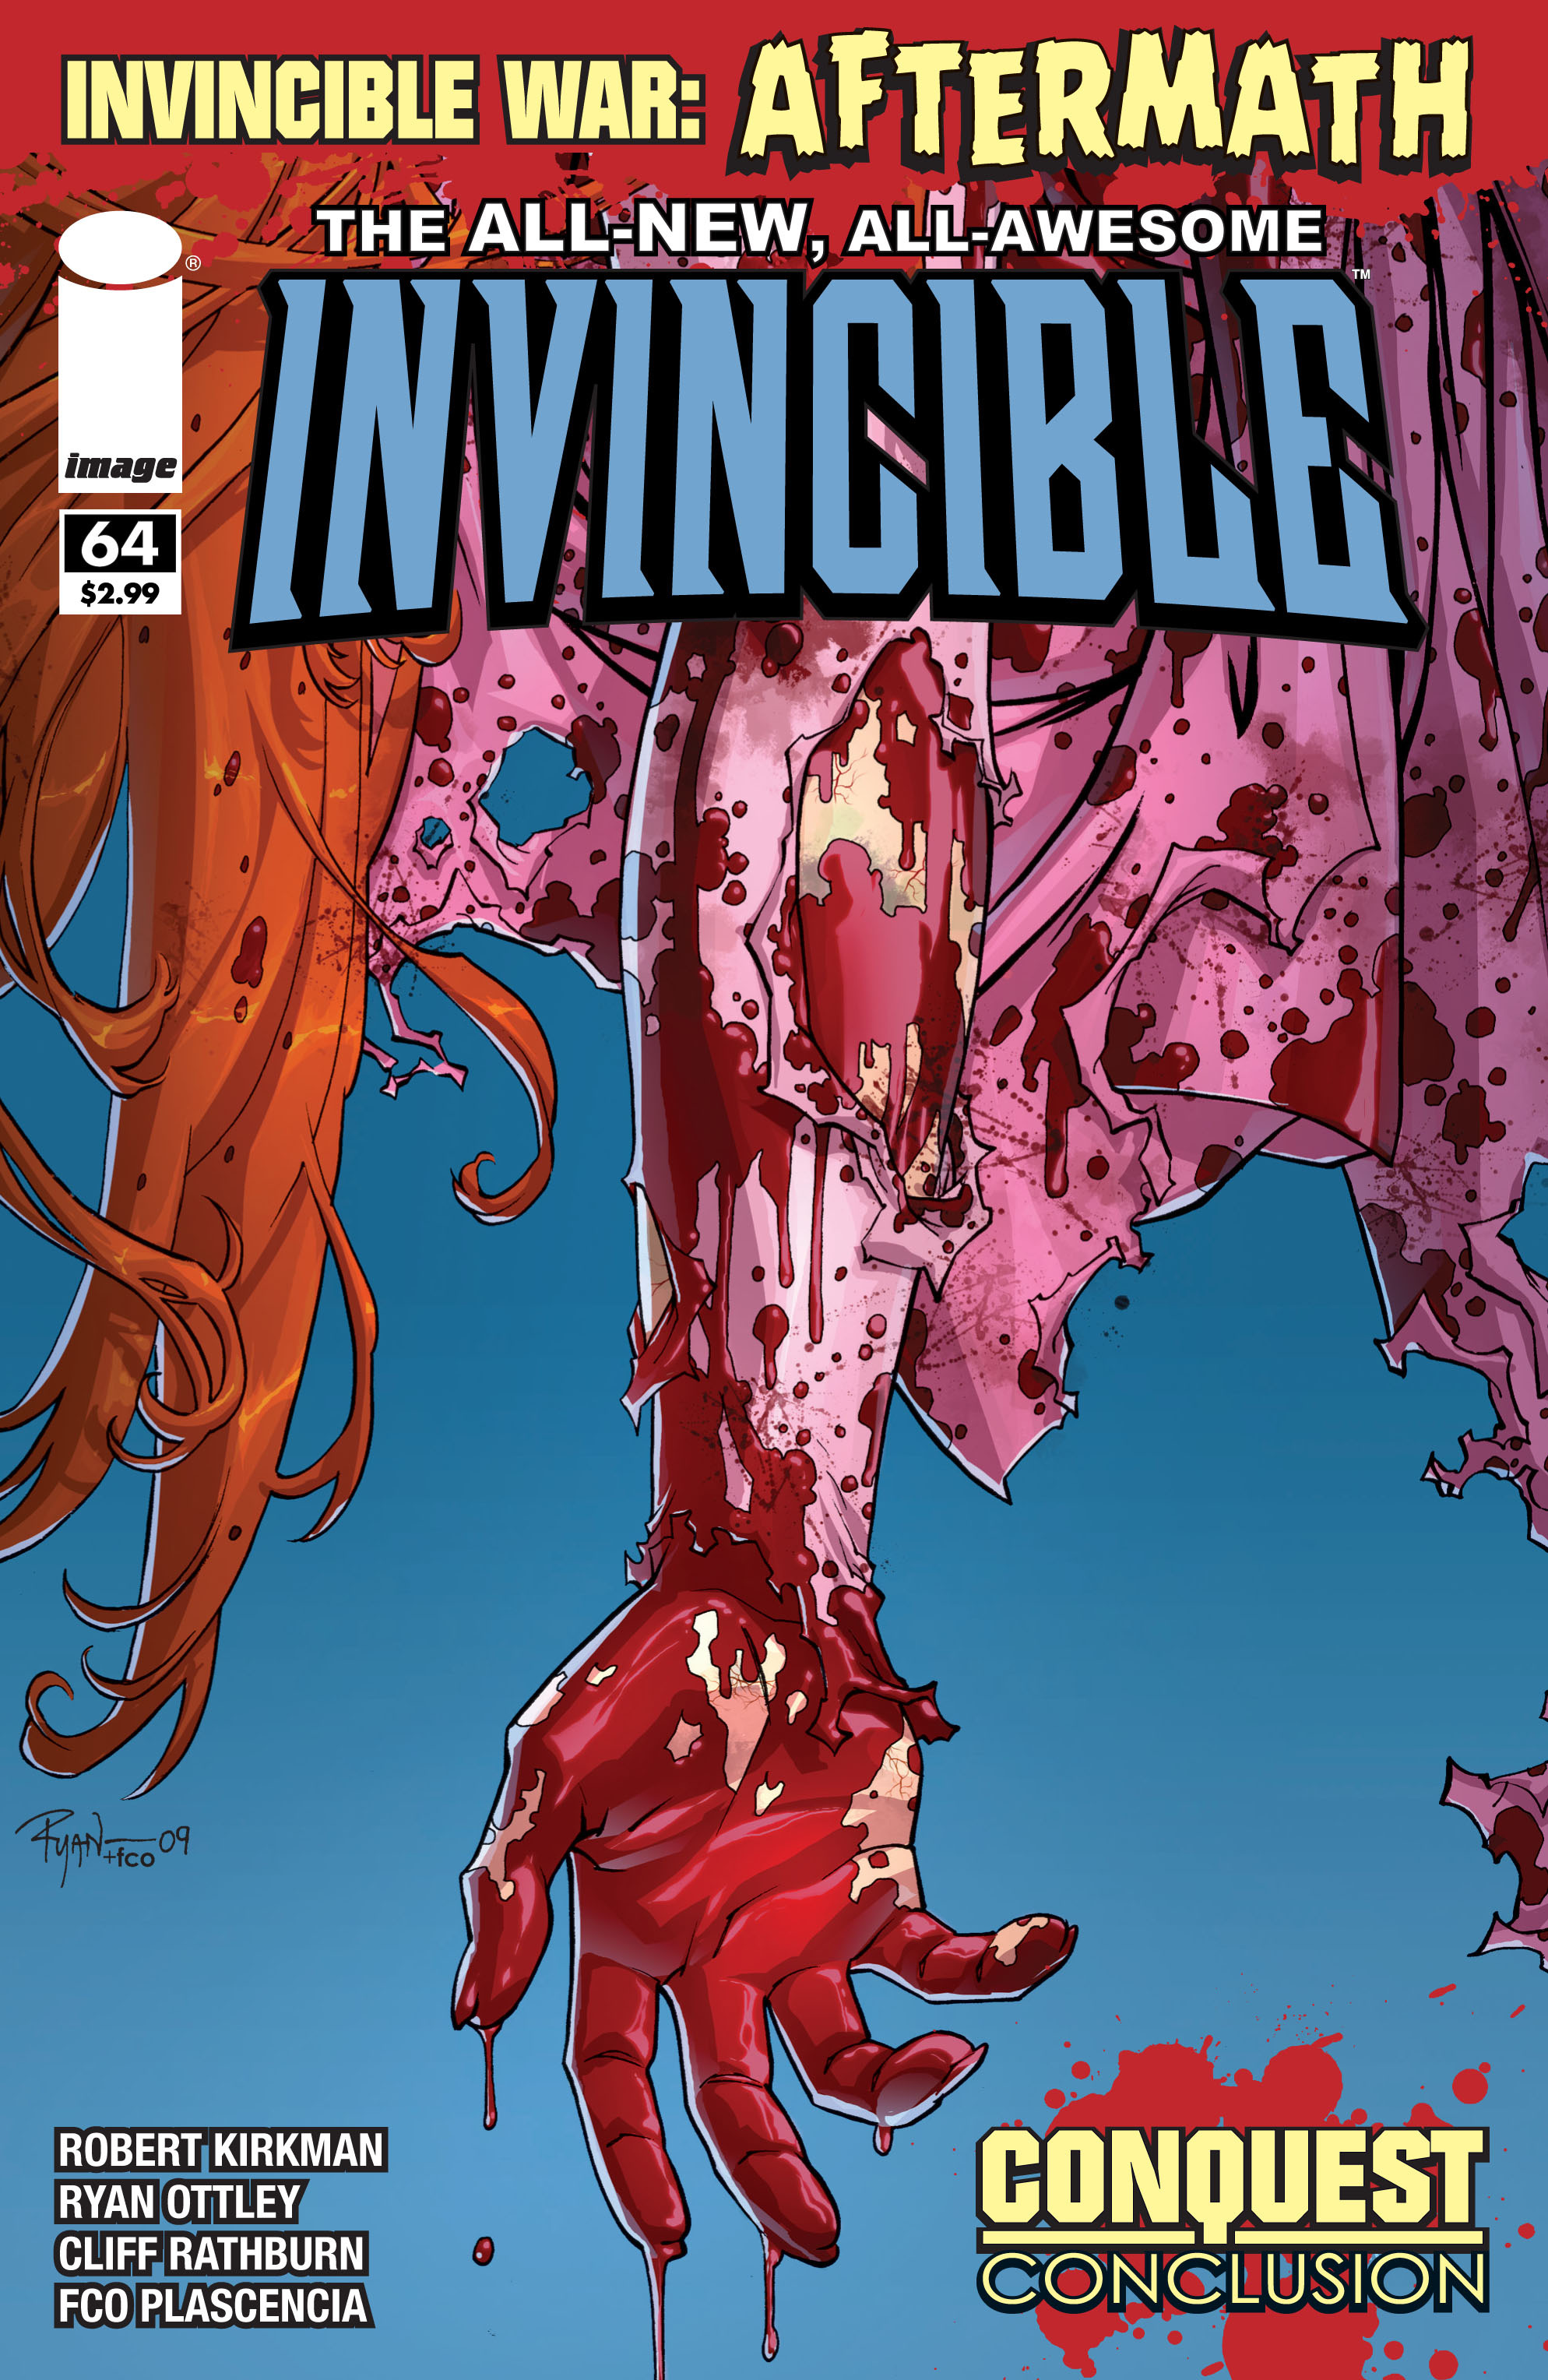 Invincible 64 Page 1